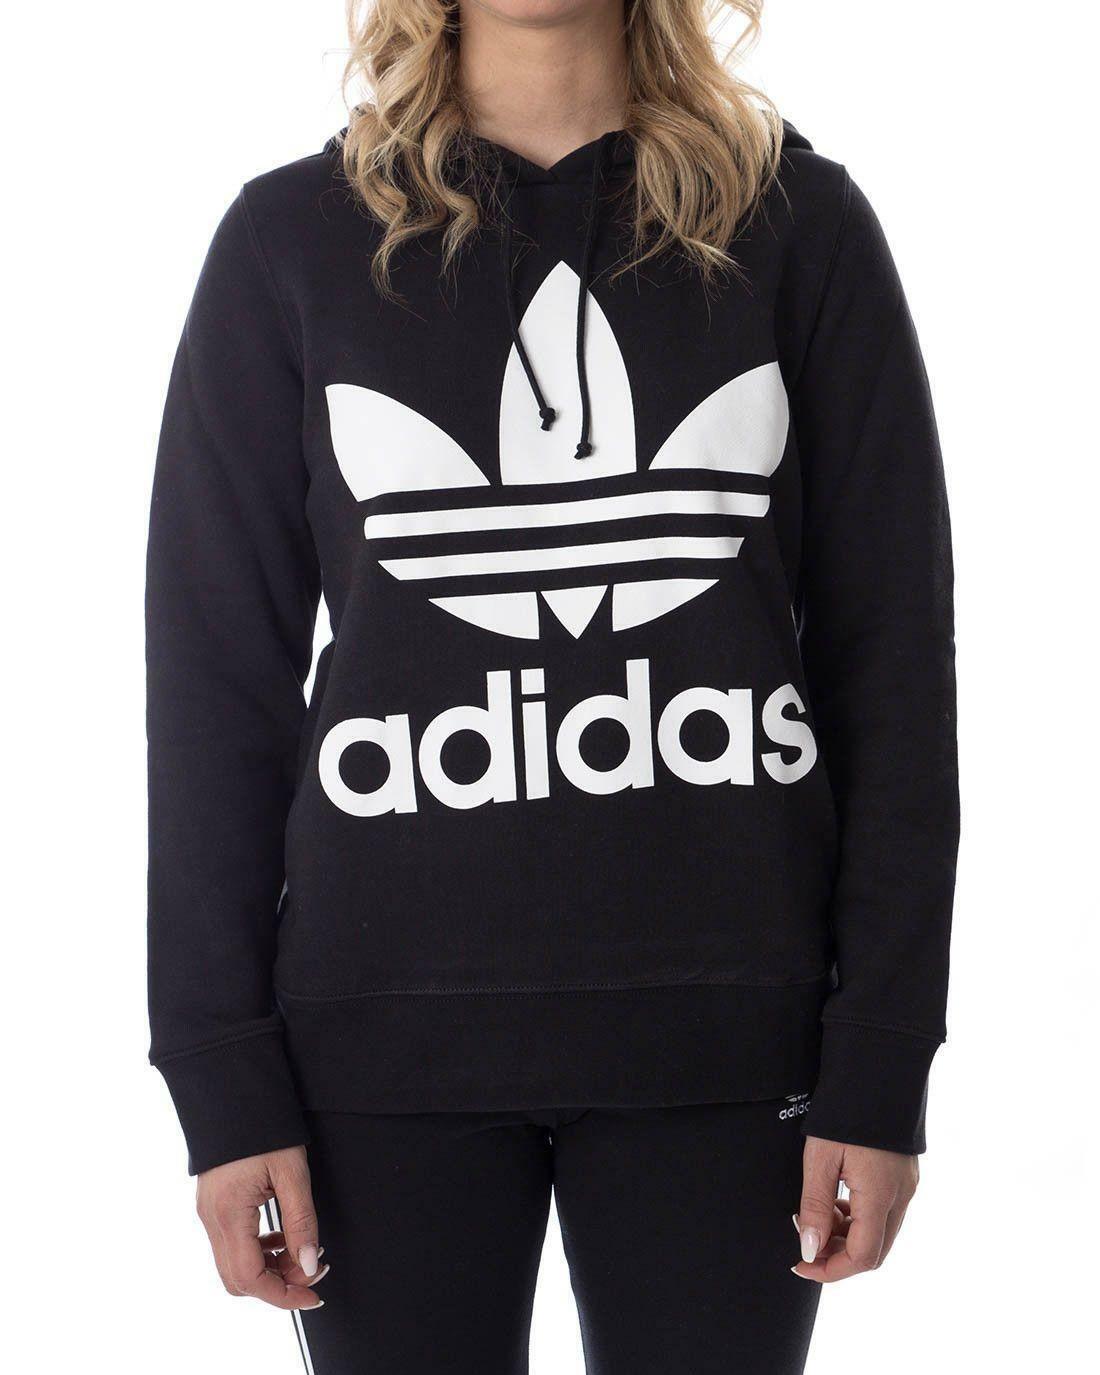 adidas adidas trefoil hoodie felpa donna cappuccio nera